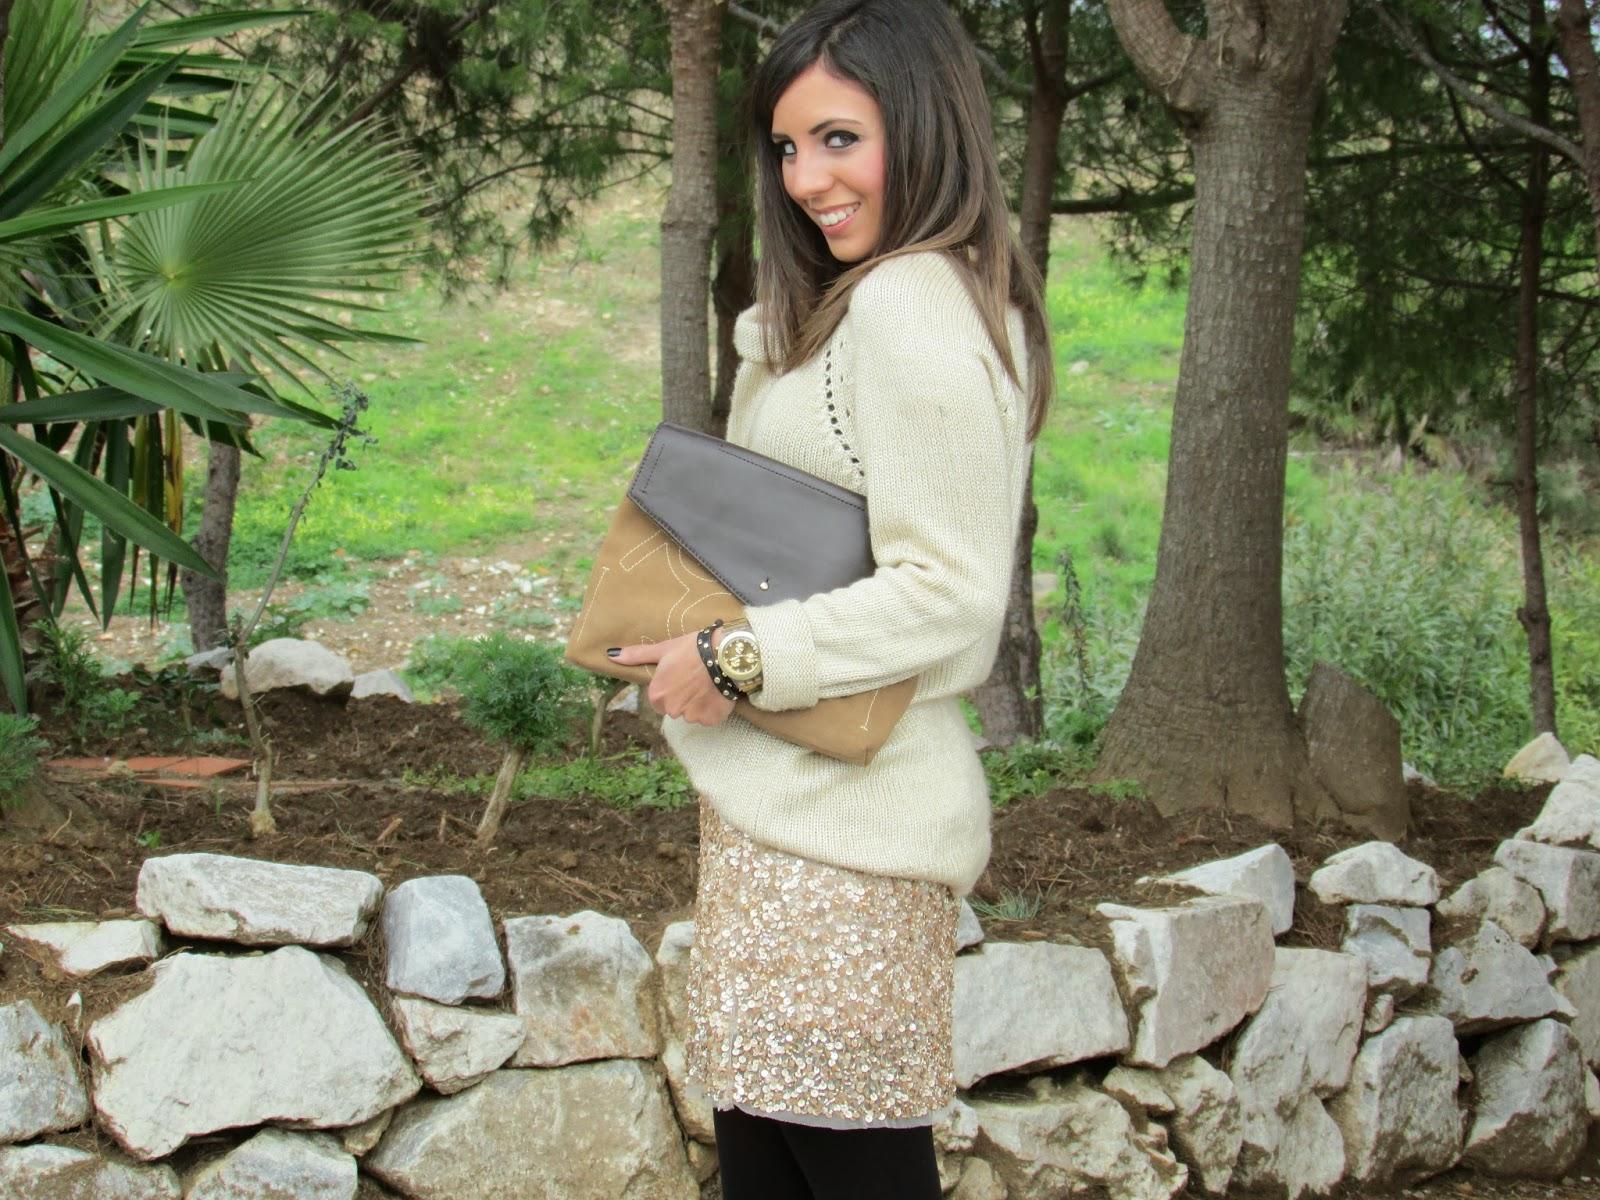 street style style fashion blogger blogger cristinastyle malaga malagueña ootd tendencias moda outfit looks teen vogue inspiration